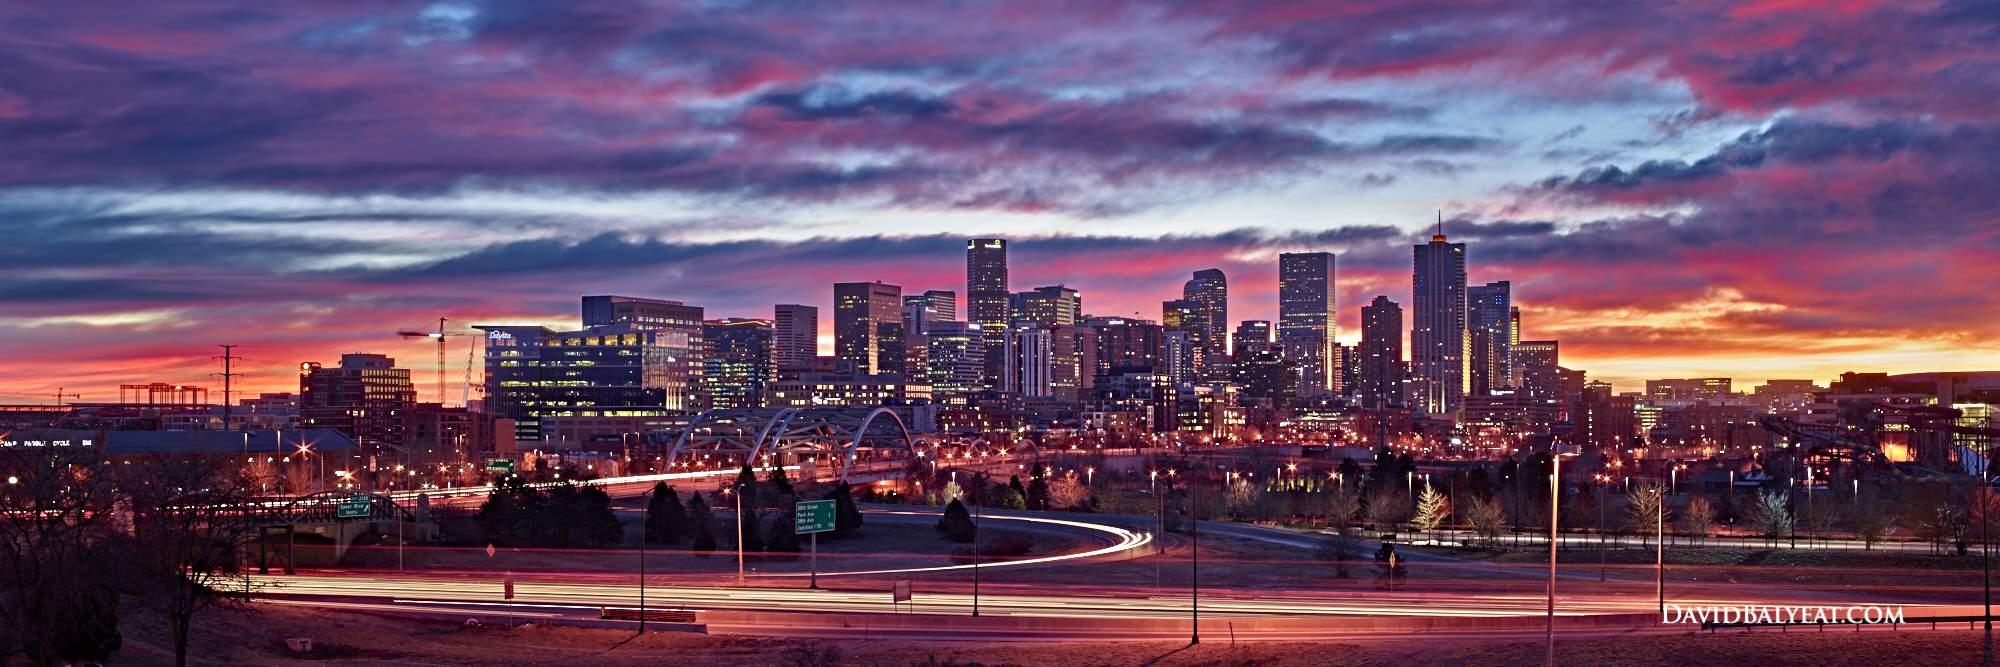 Seattle Washington Fall Skyline Wallpaper Mile High City Denver David Balyeat Photography Portfolio